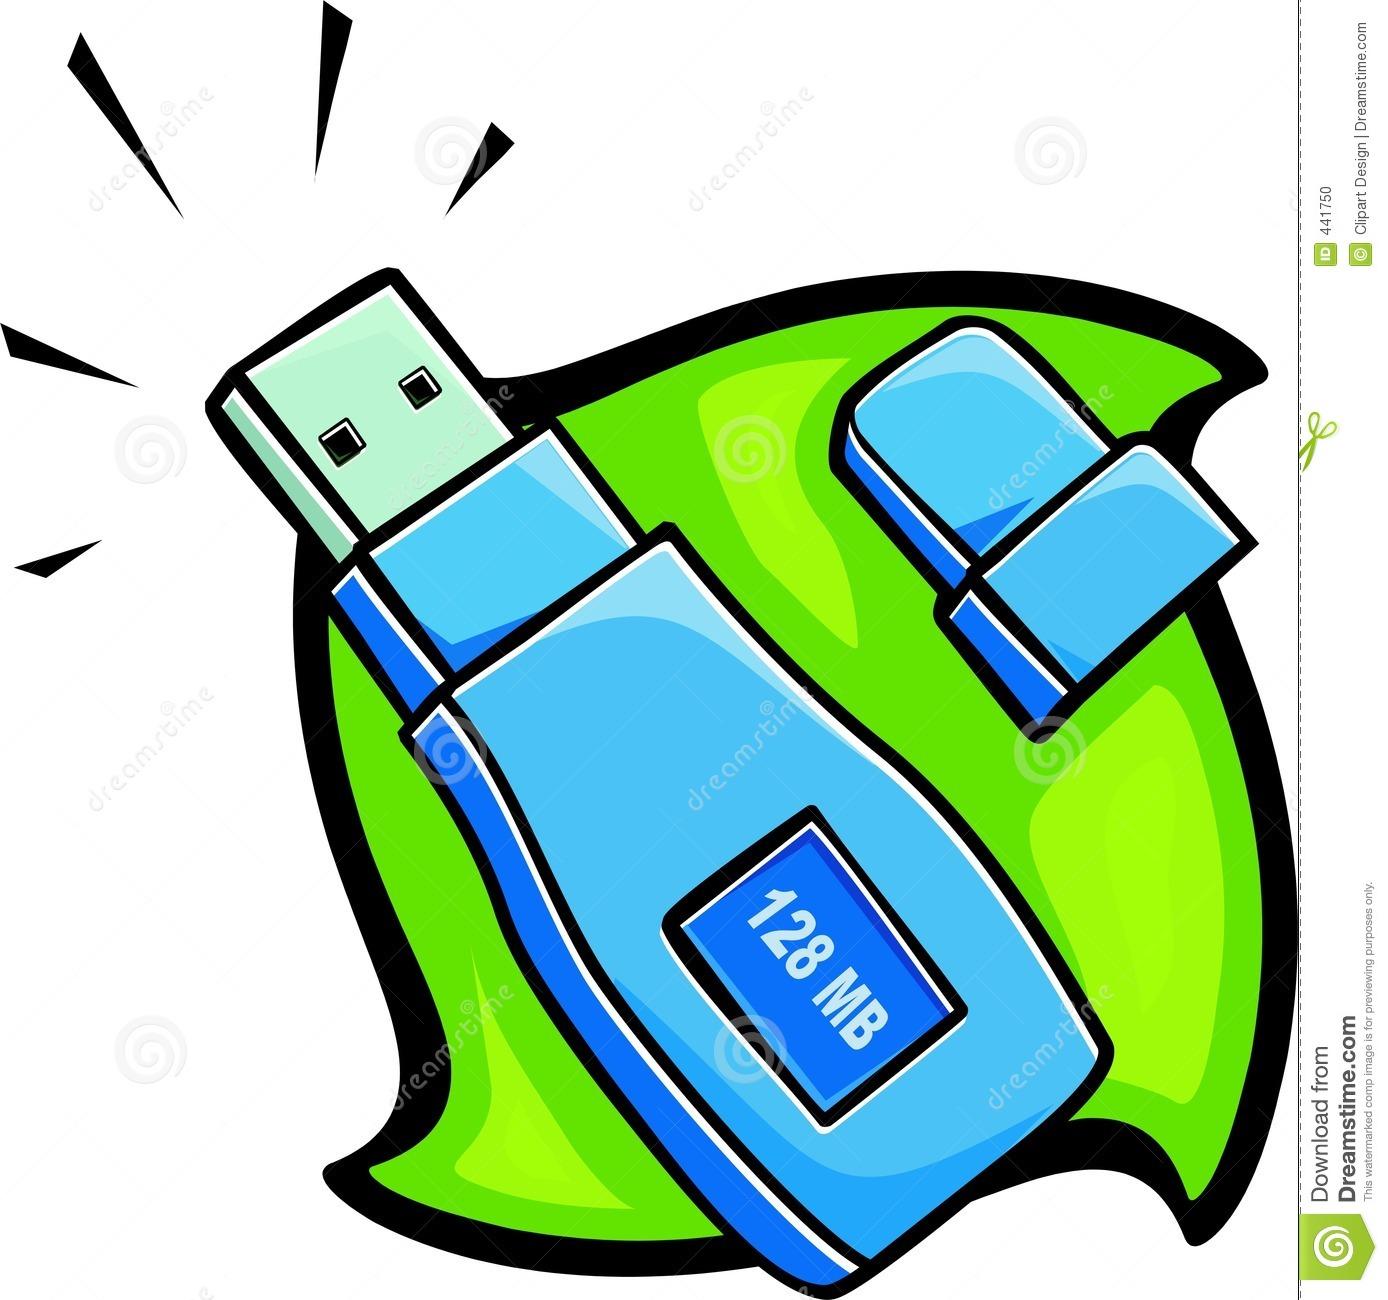 1388x1300 Flash Memory Clipart